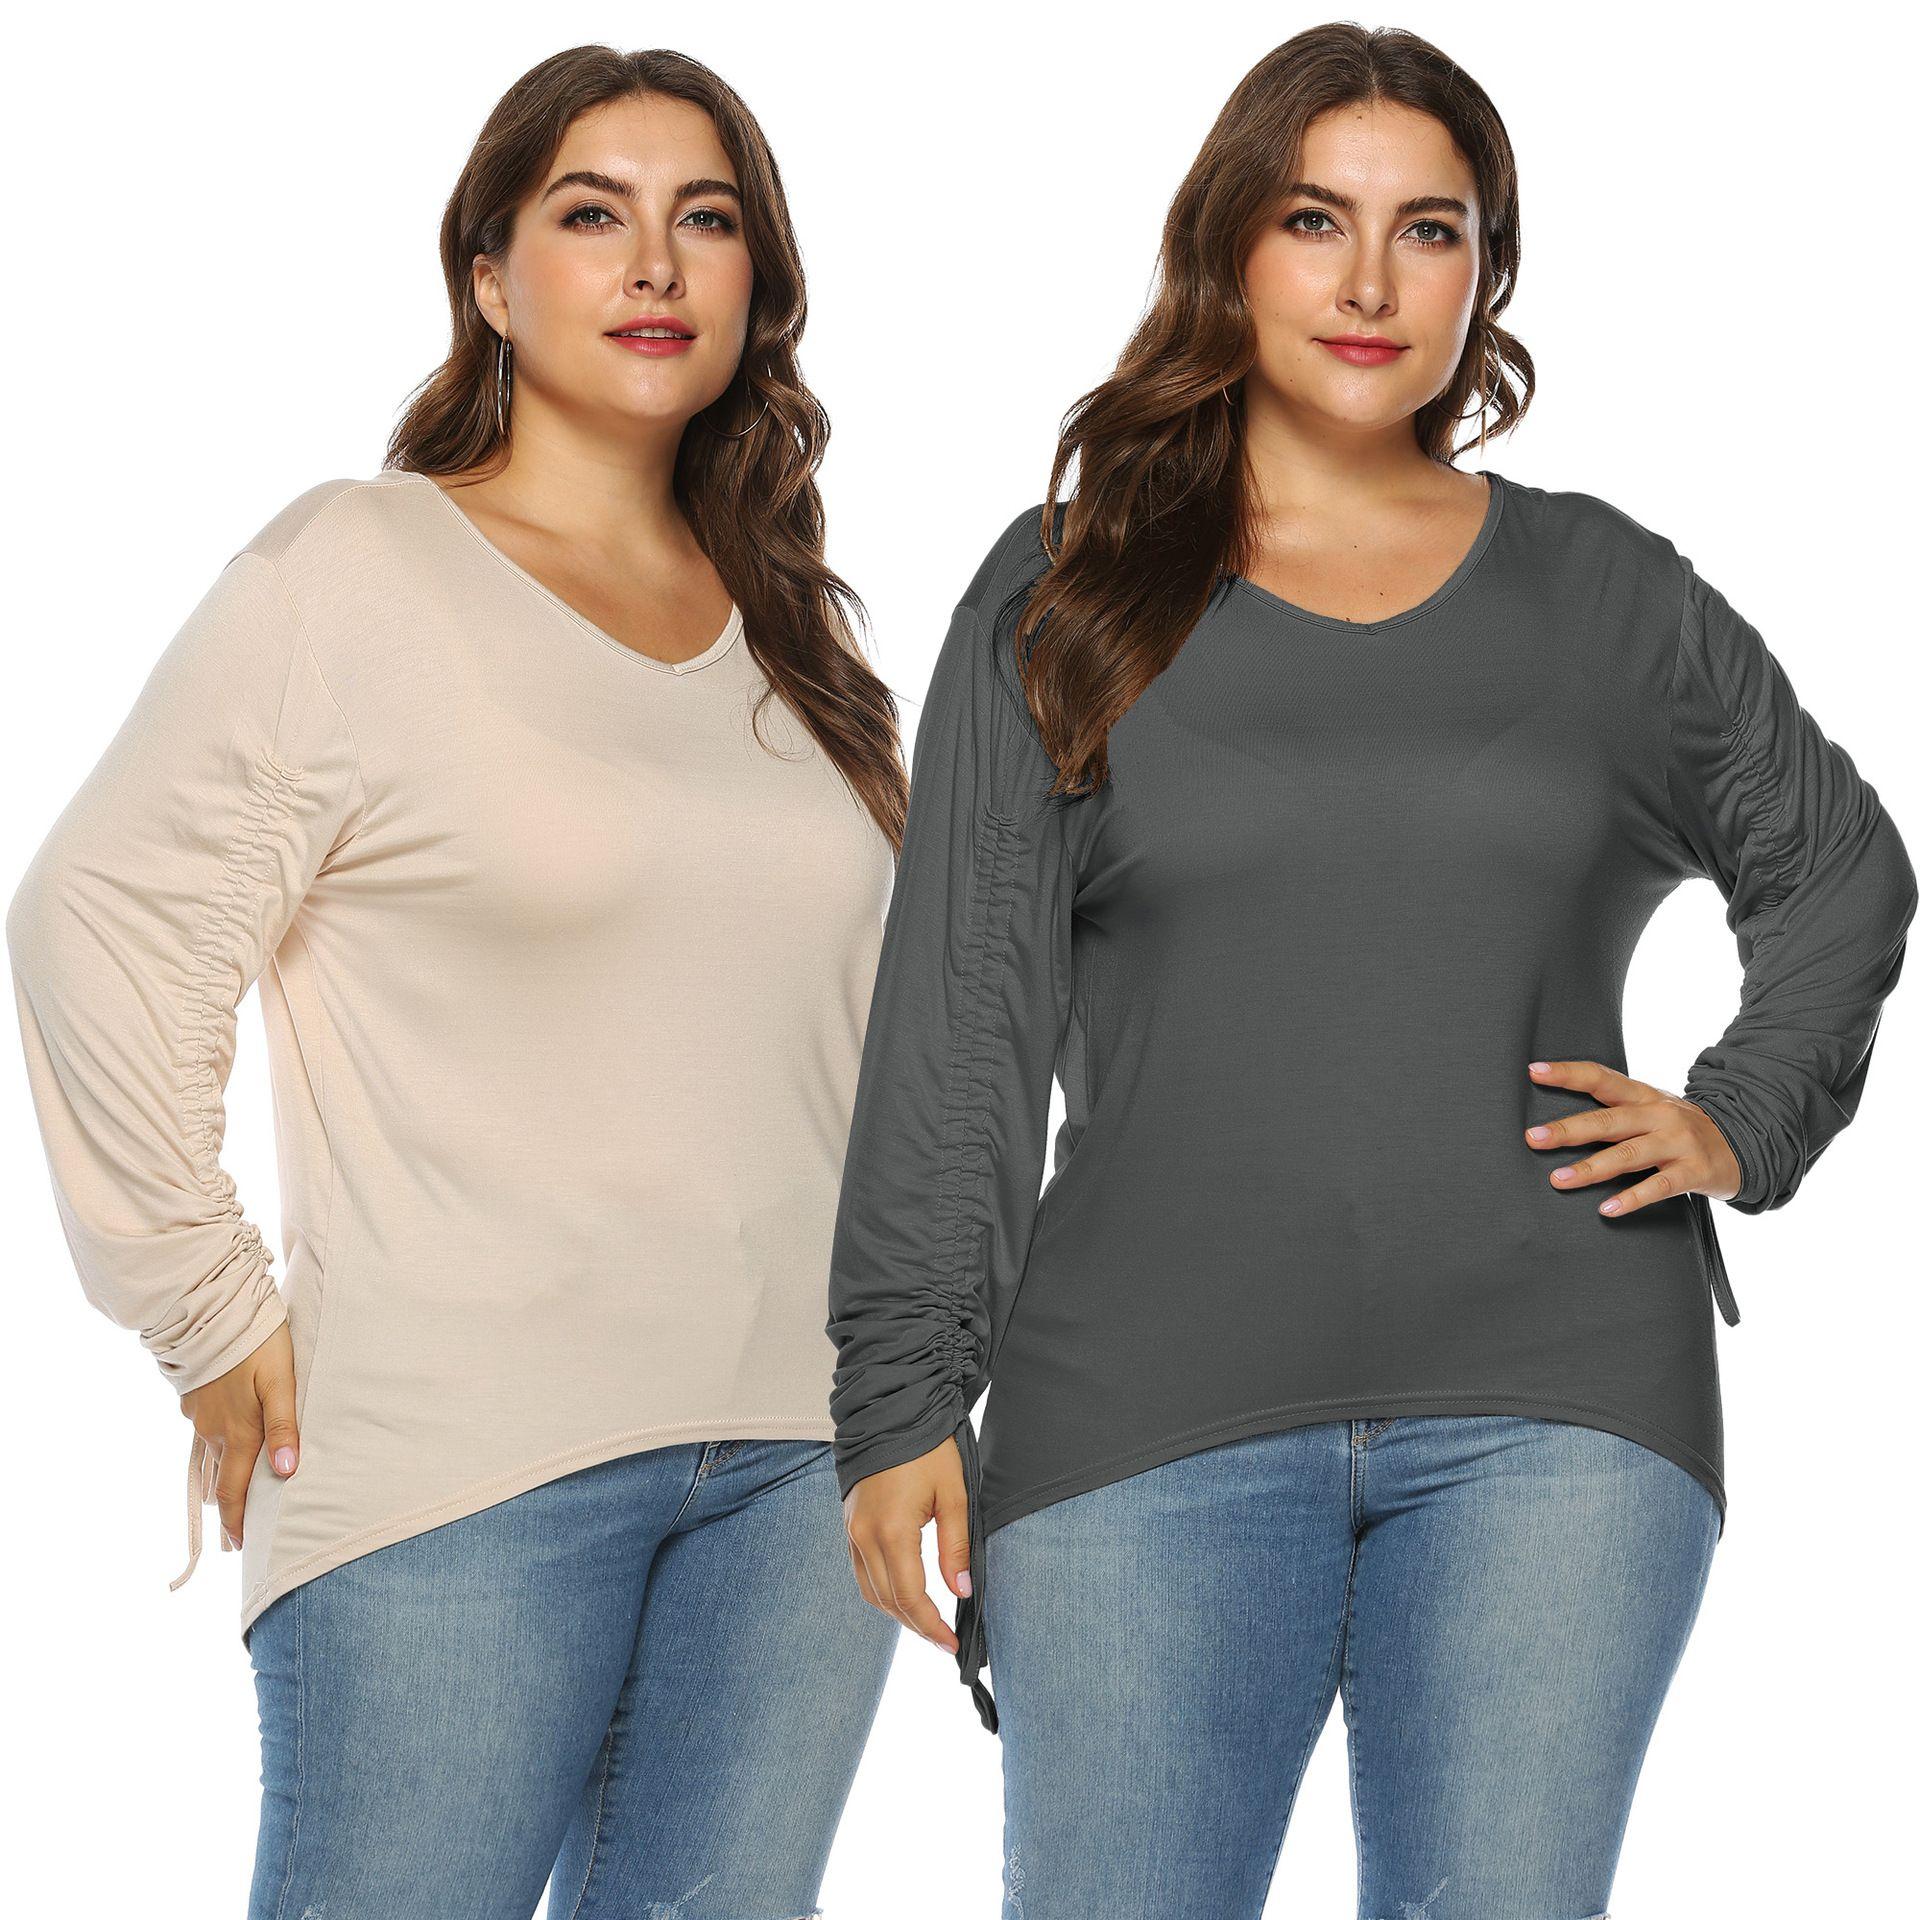 62707e6ccf6 Women Simple Plus Size Shirt Tops Long Sleeve Femme Scoop Neck Elegant  Summer T Shirt Elastic Cotton Tee Shirts Plus Size XL 3XL Female T Shirt  Sayings ...